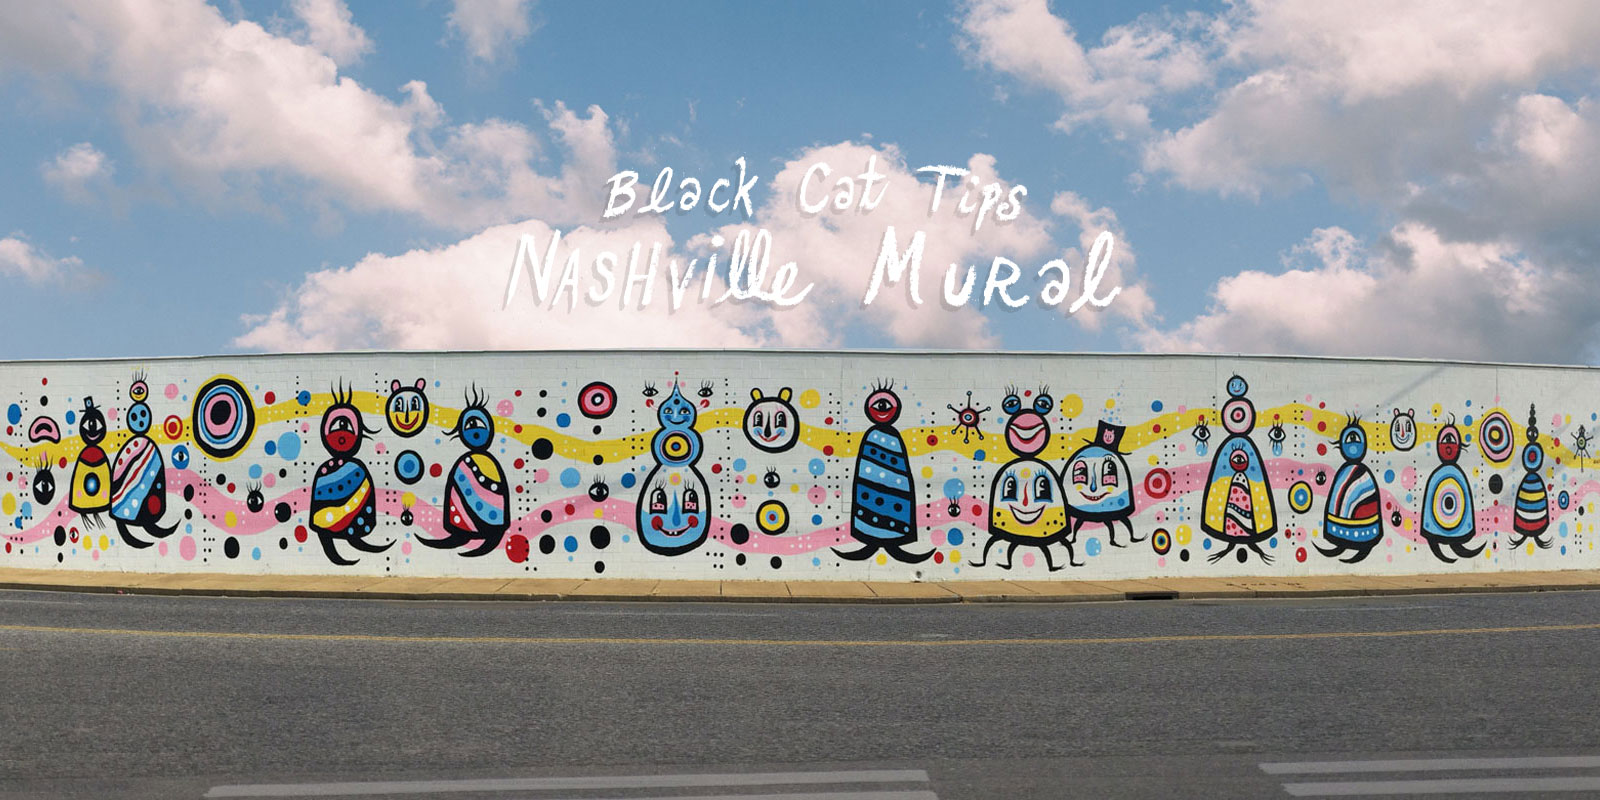 BlackCatTips Nashville Mural